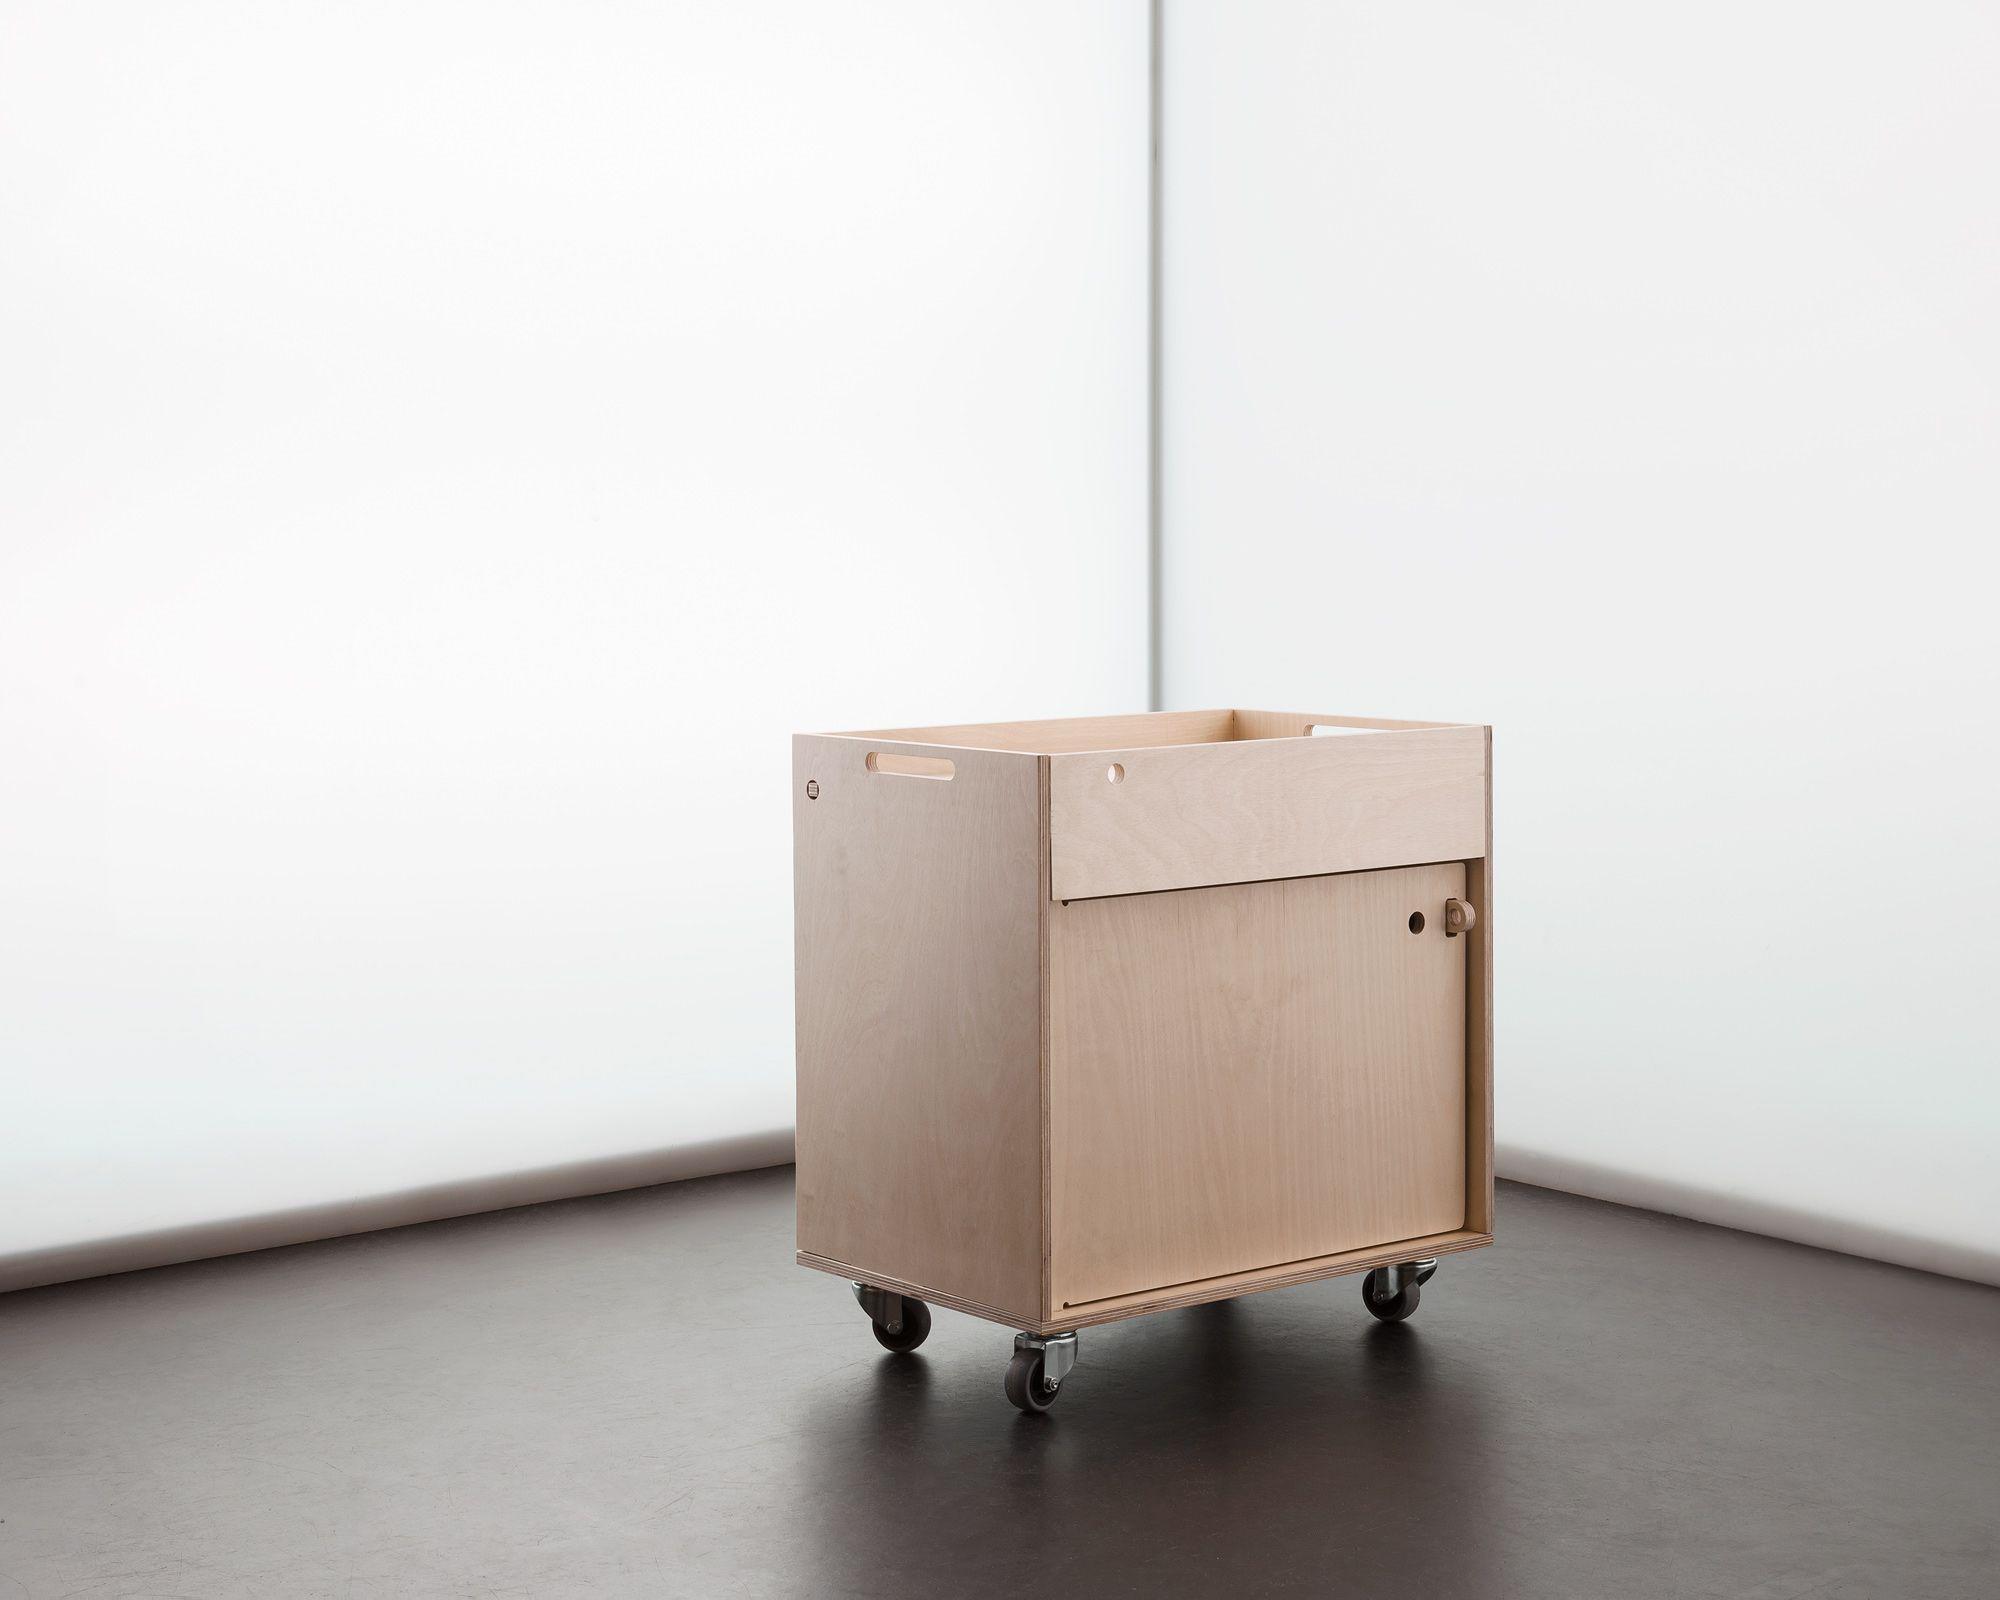 Furniture designed for inspiring workplaces | Kita und Möbel